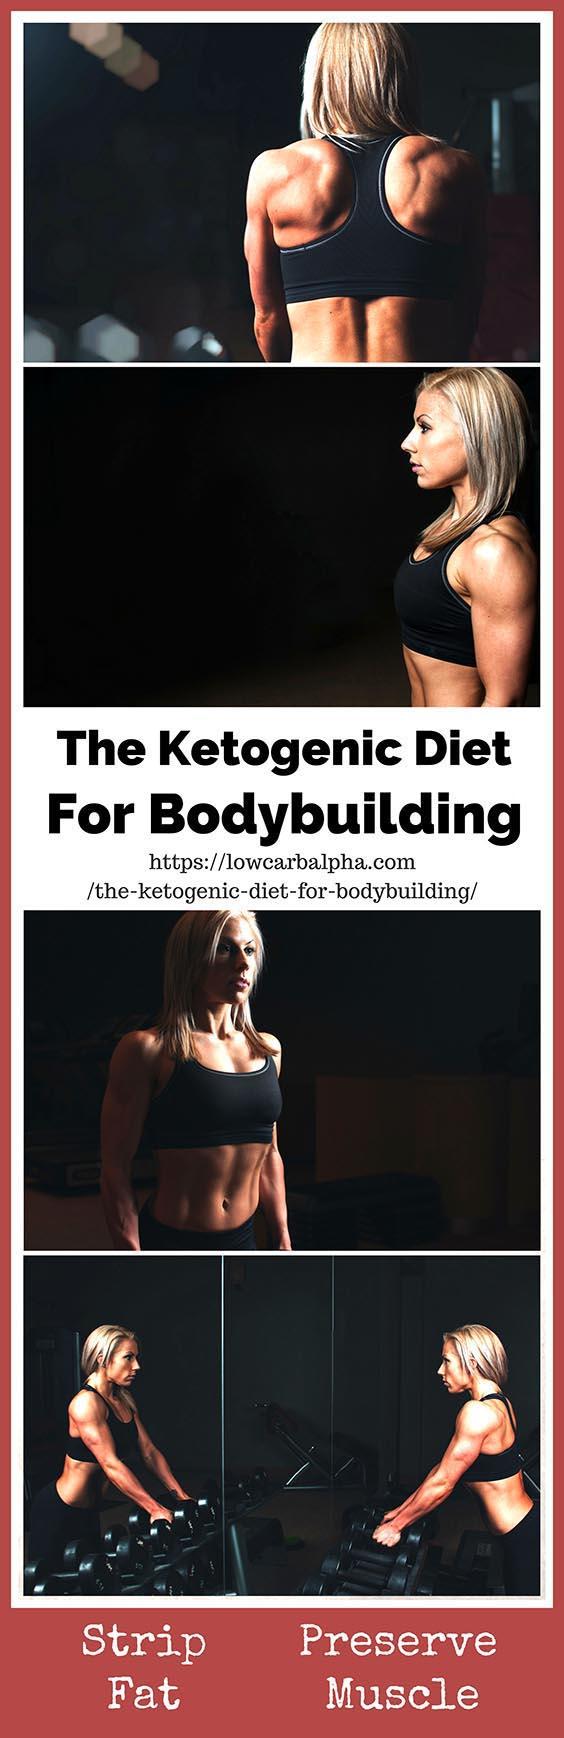 Ketogenic Diet for Bodybuilding